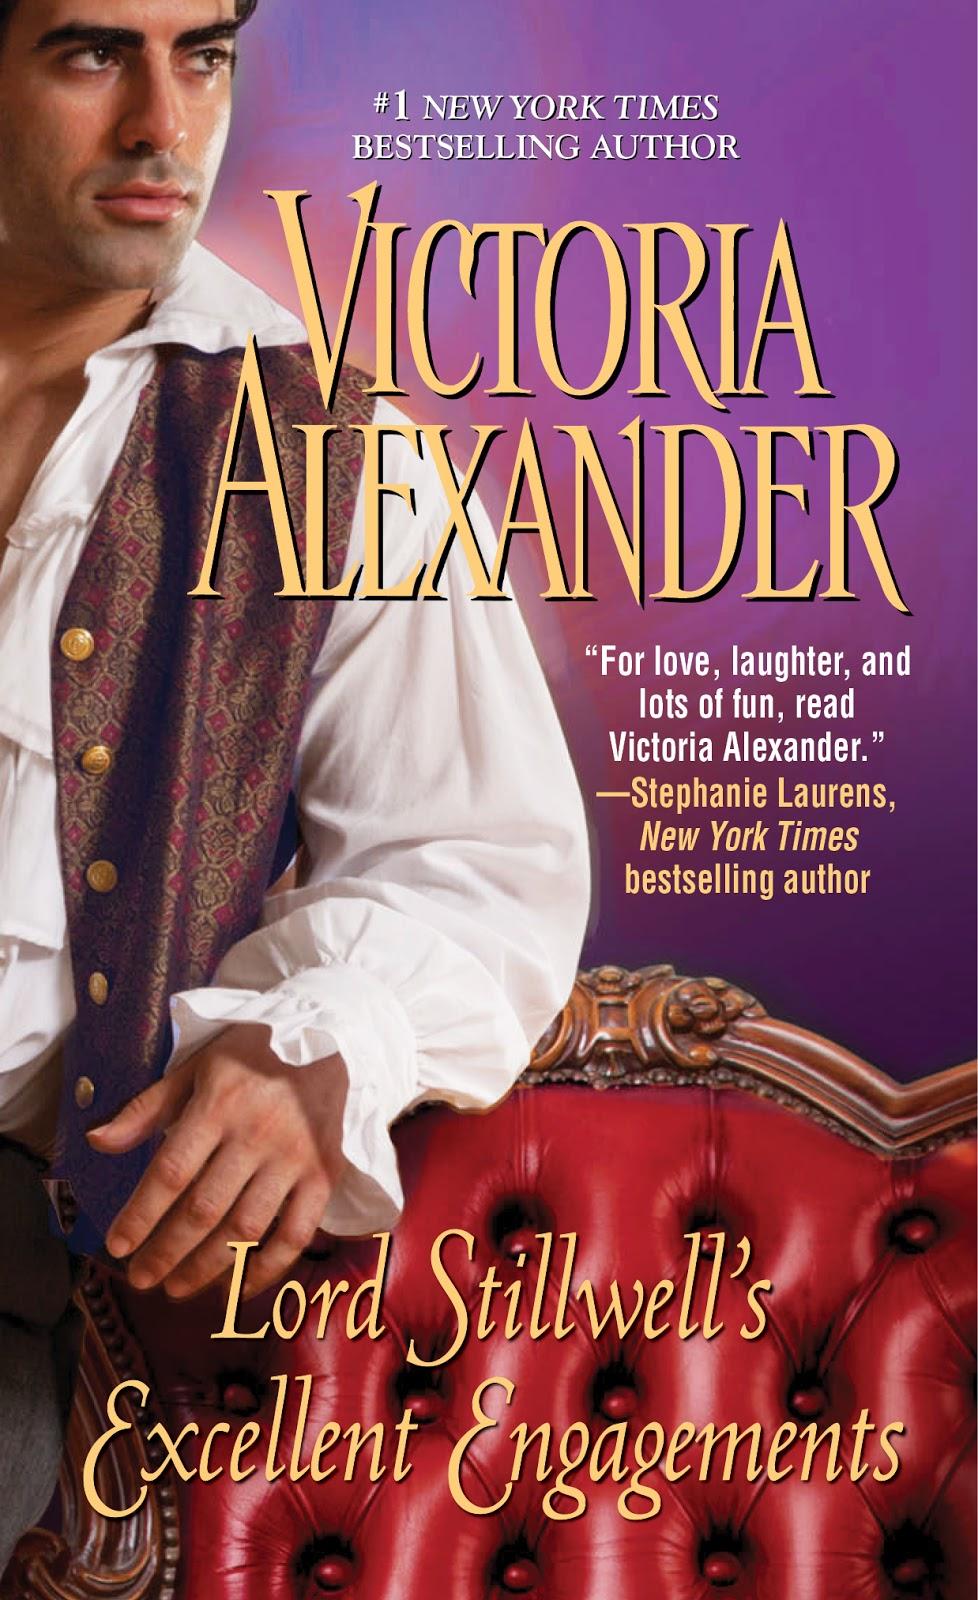 Victoria Alexander: Anatomy Of A Series